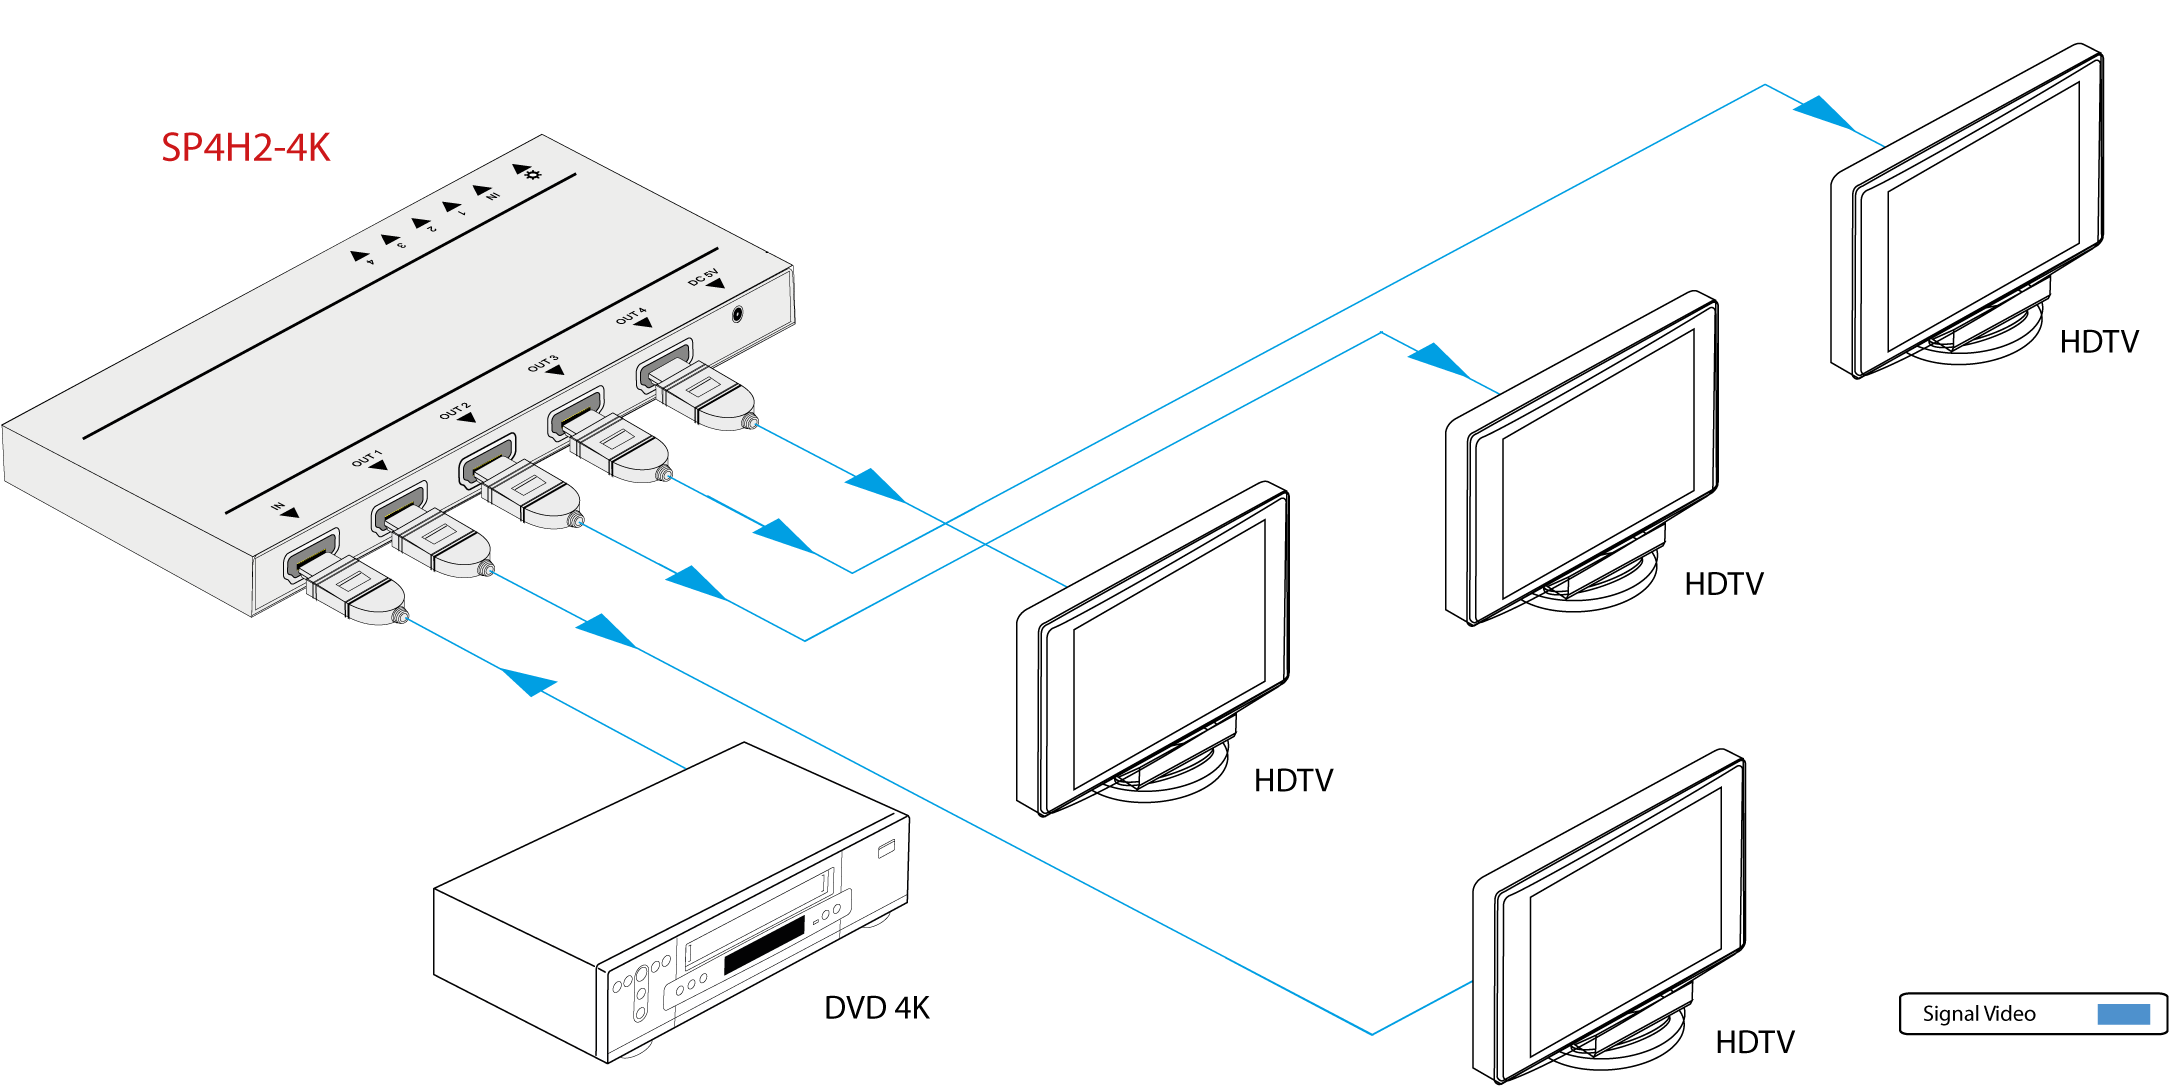 SP4H2-4K | Distributeur HDMI 1x4 extra plat 4K@4:4:4